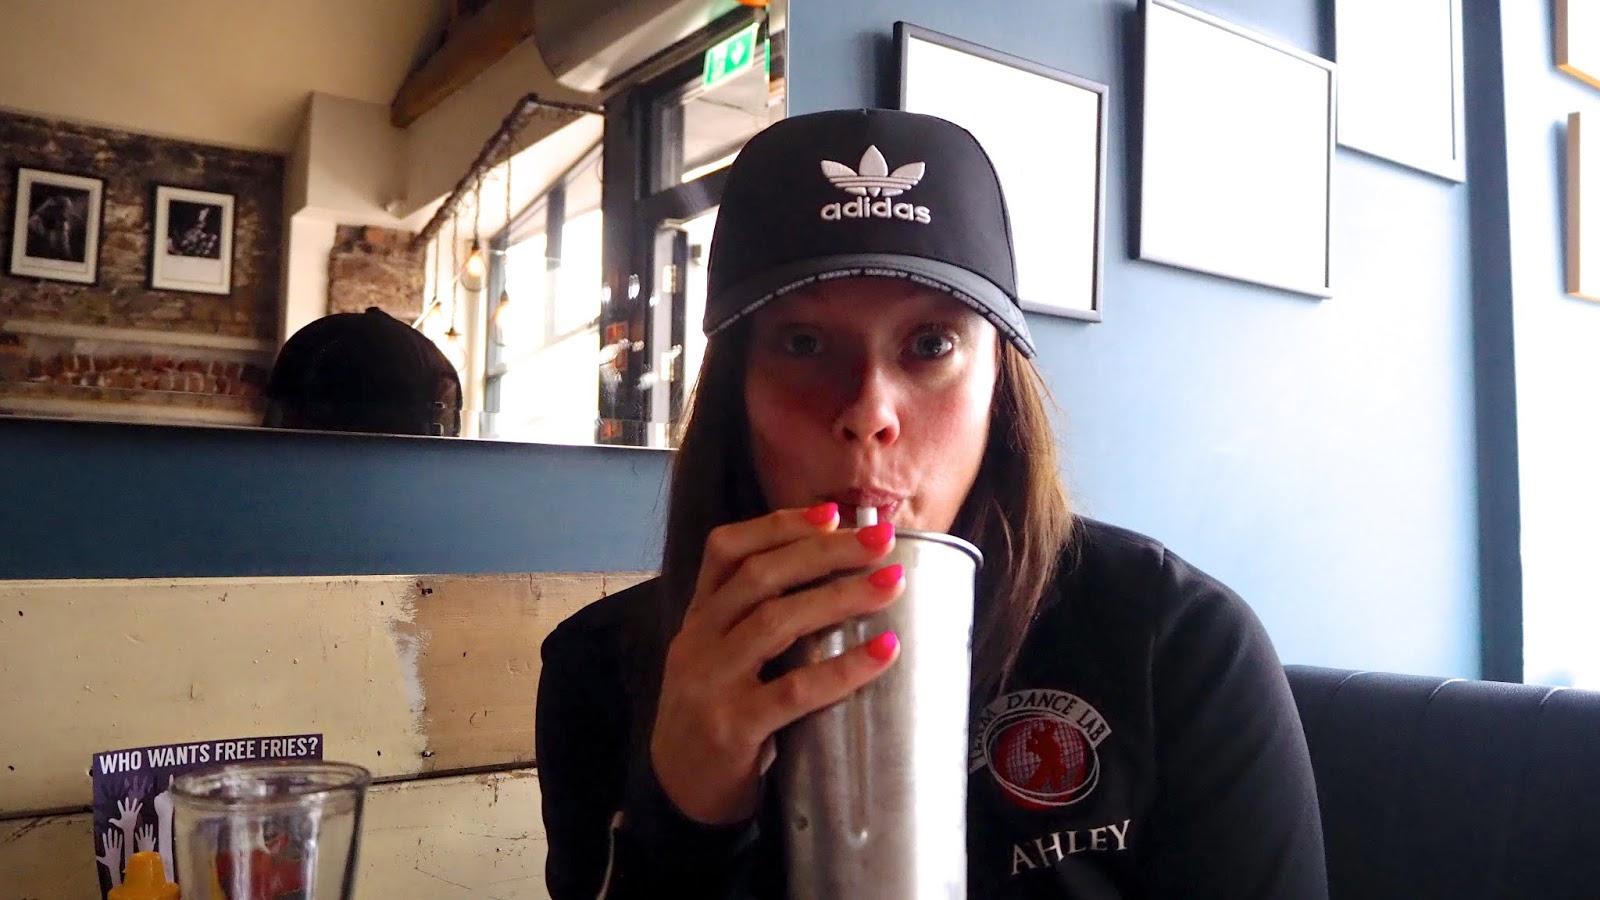 Drinking a milkshake